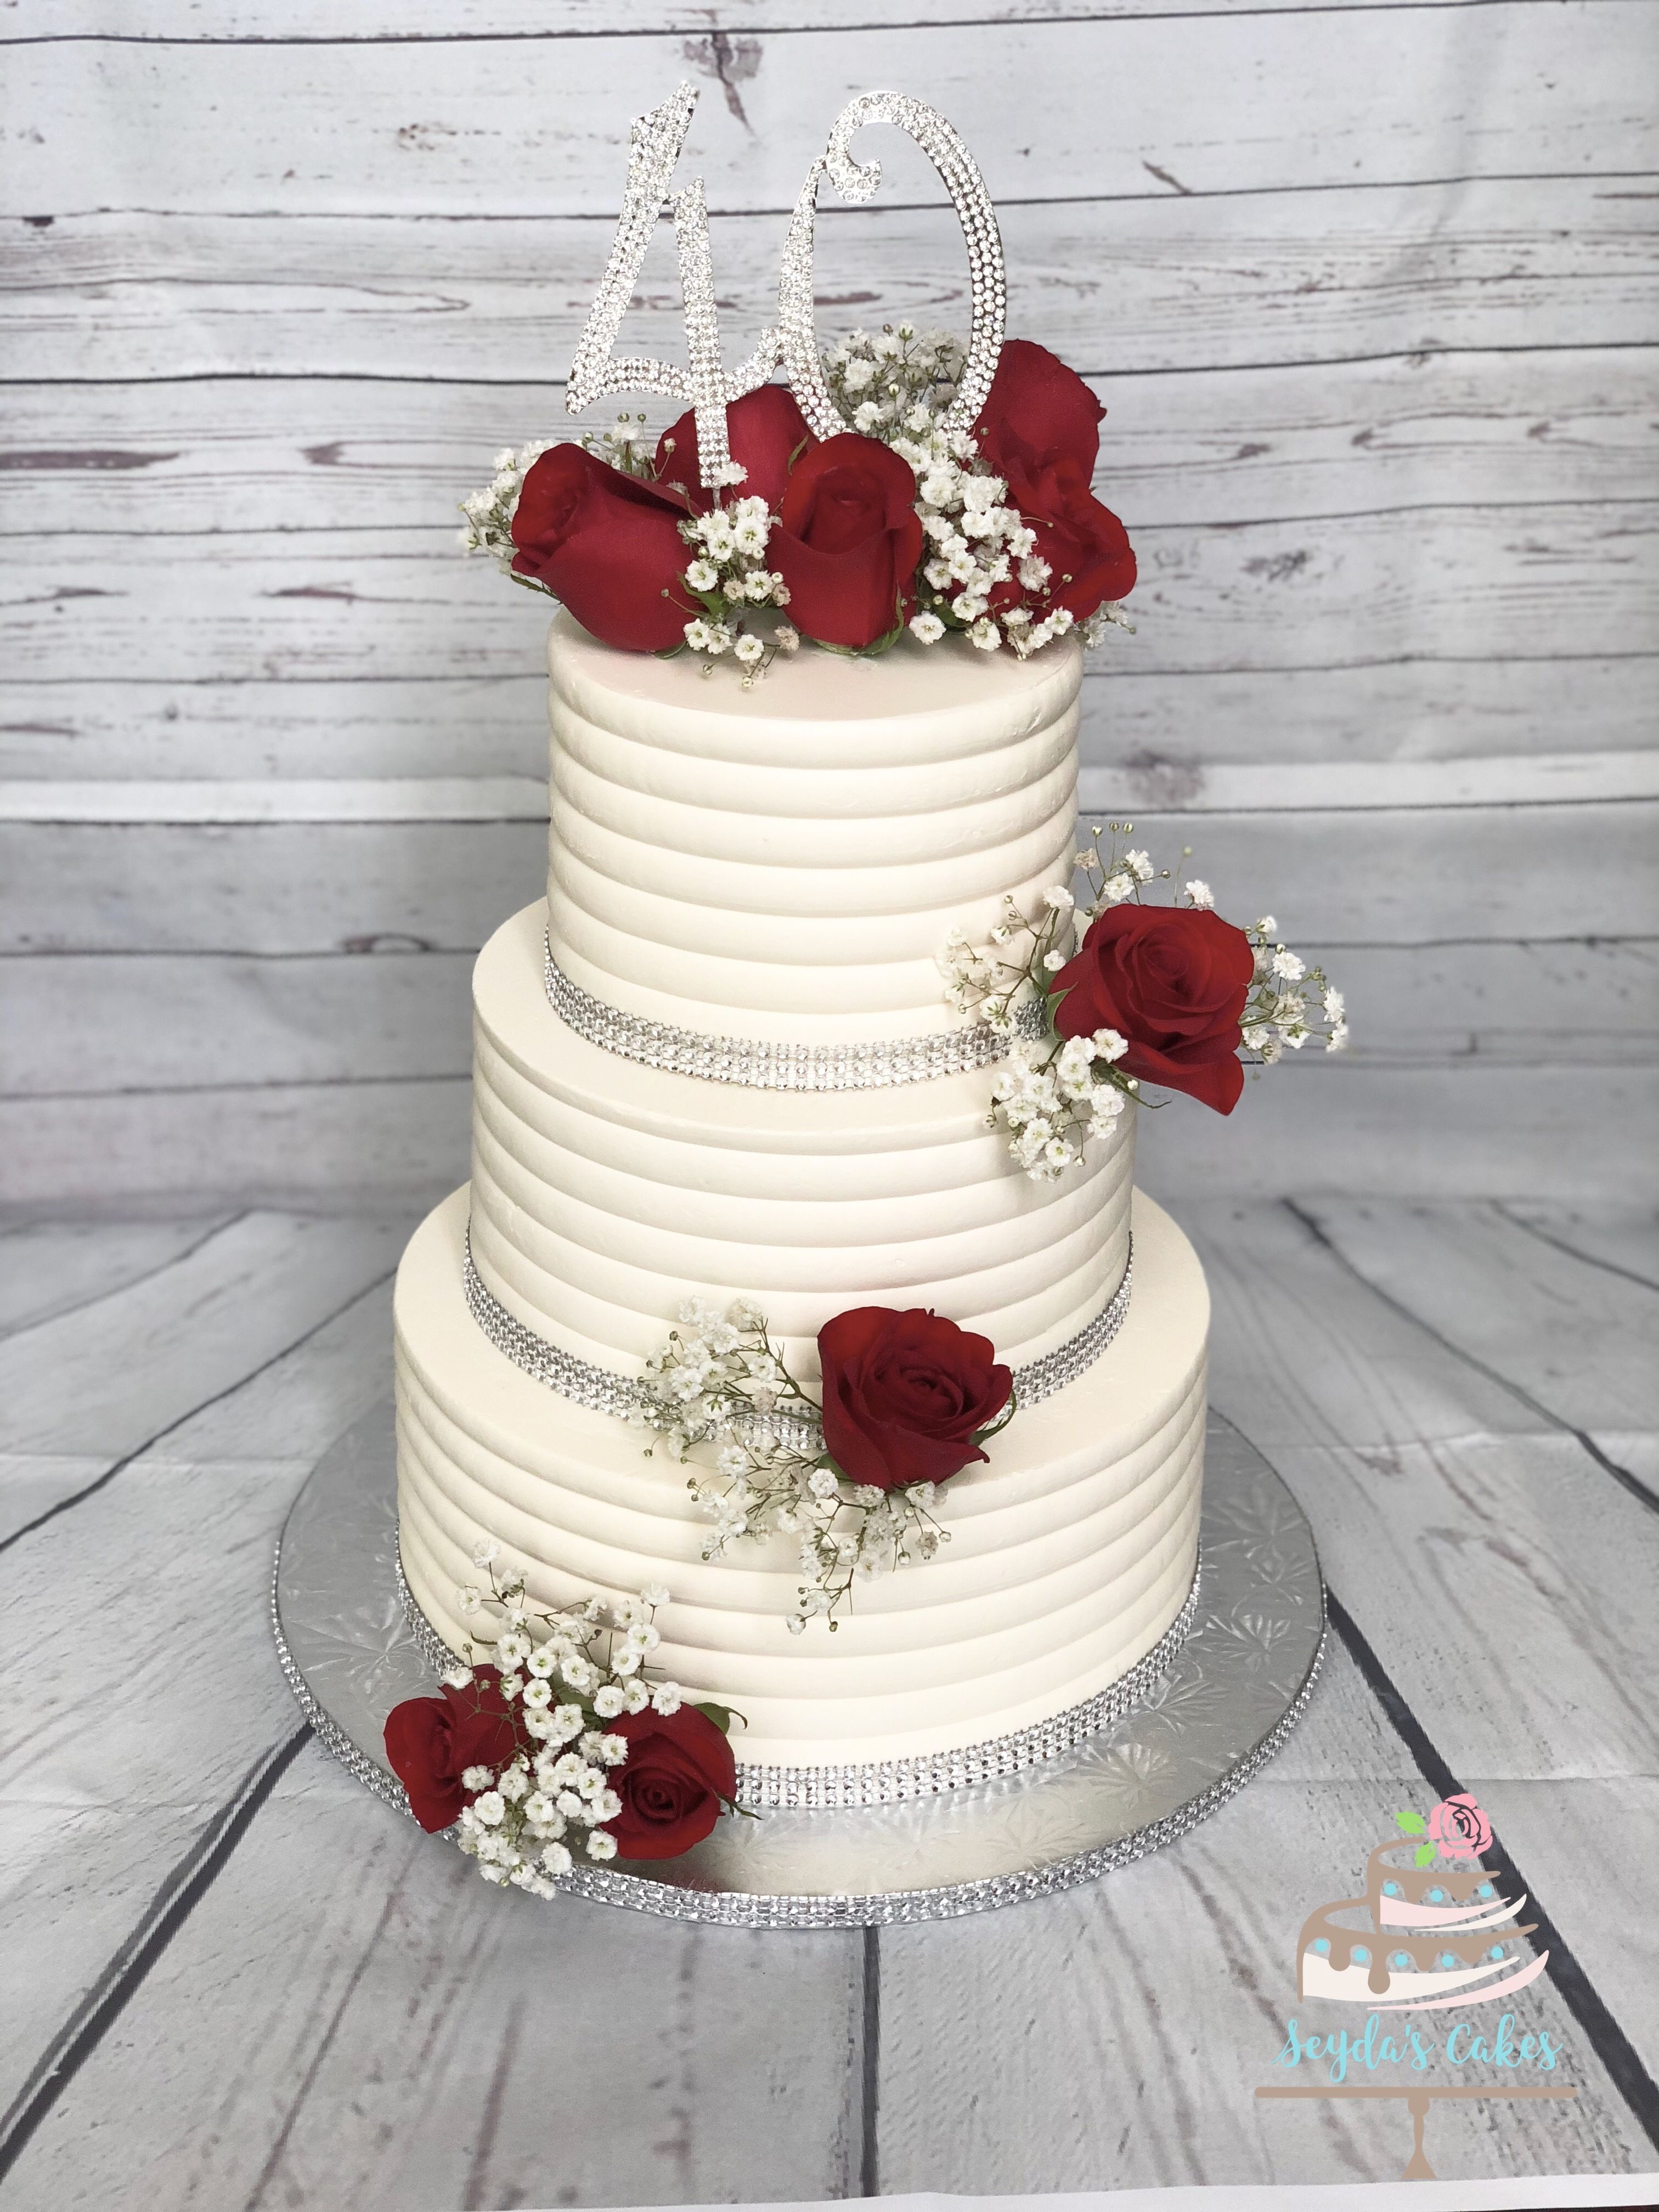 Creative Anniversary Cake Ideas Pictures Romantic Anniversary Cake